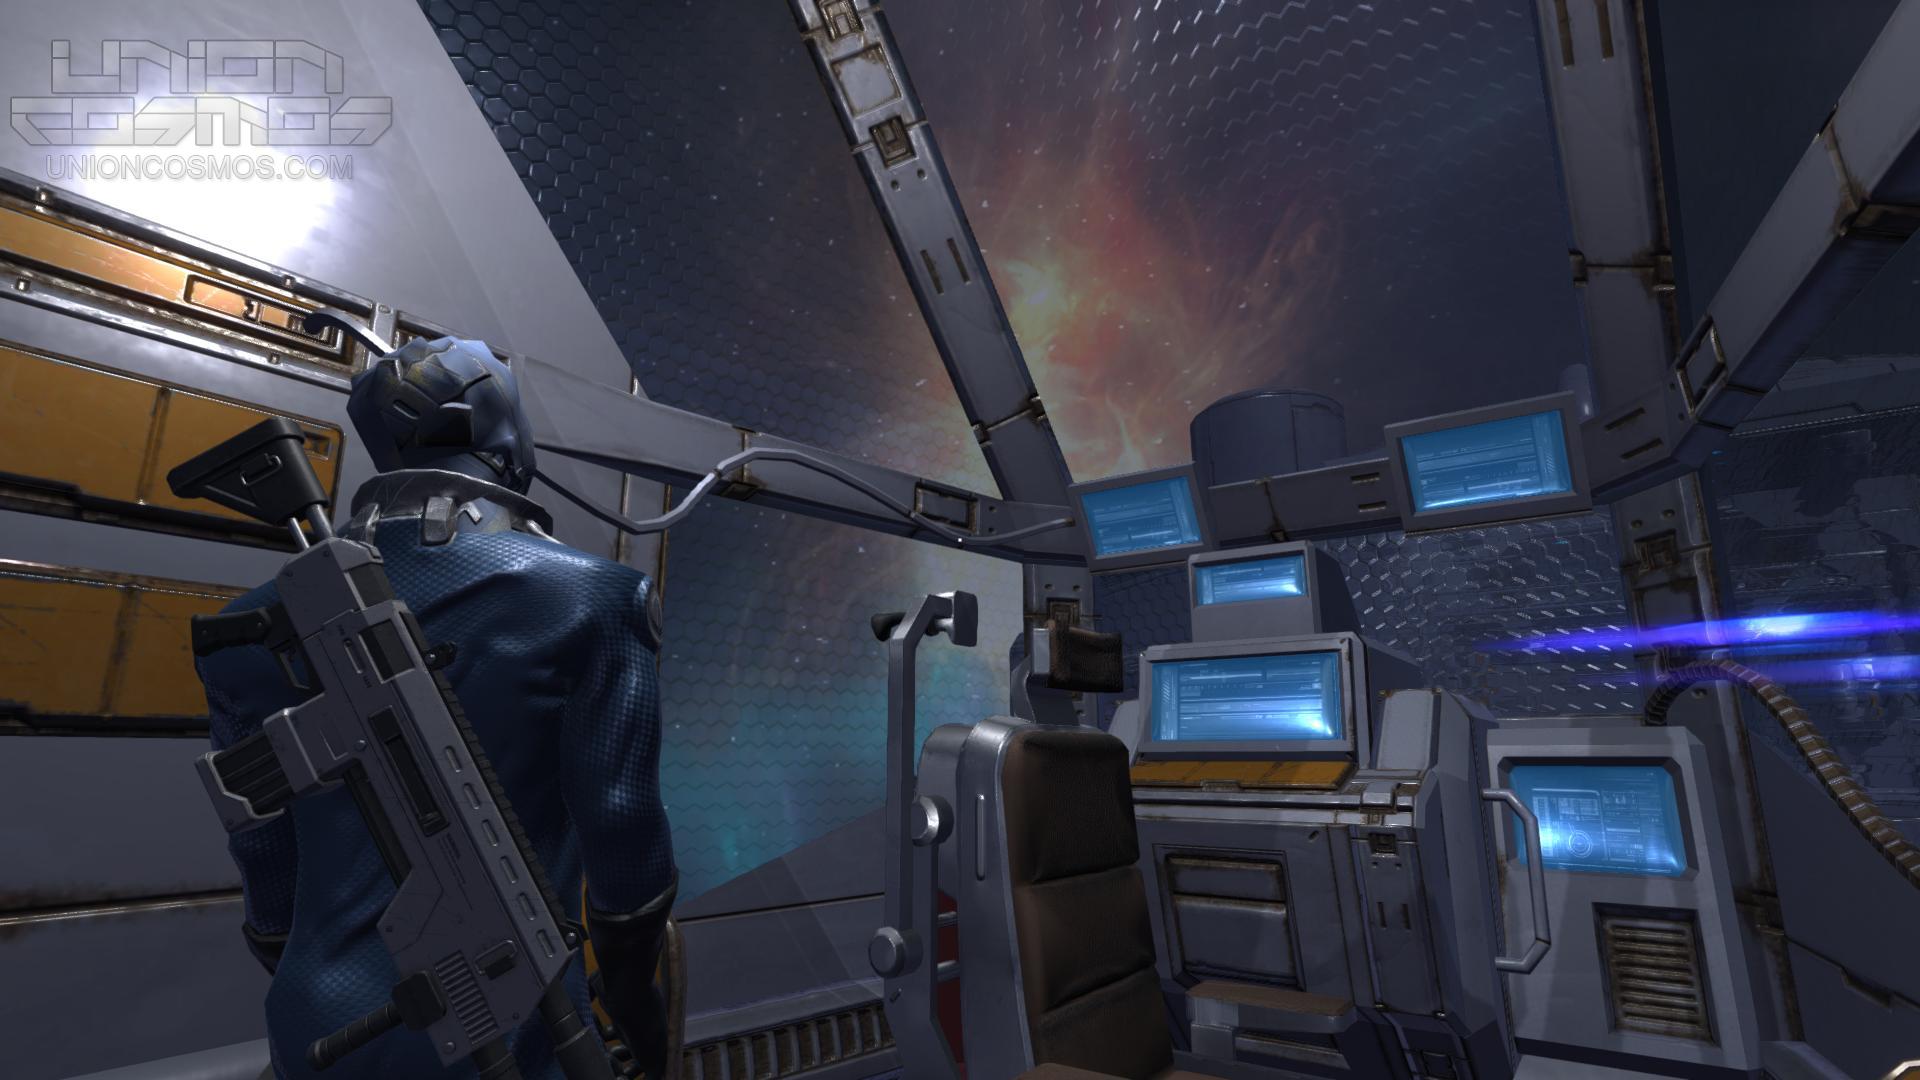 union-cosmos-space-journey-screenshot-2